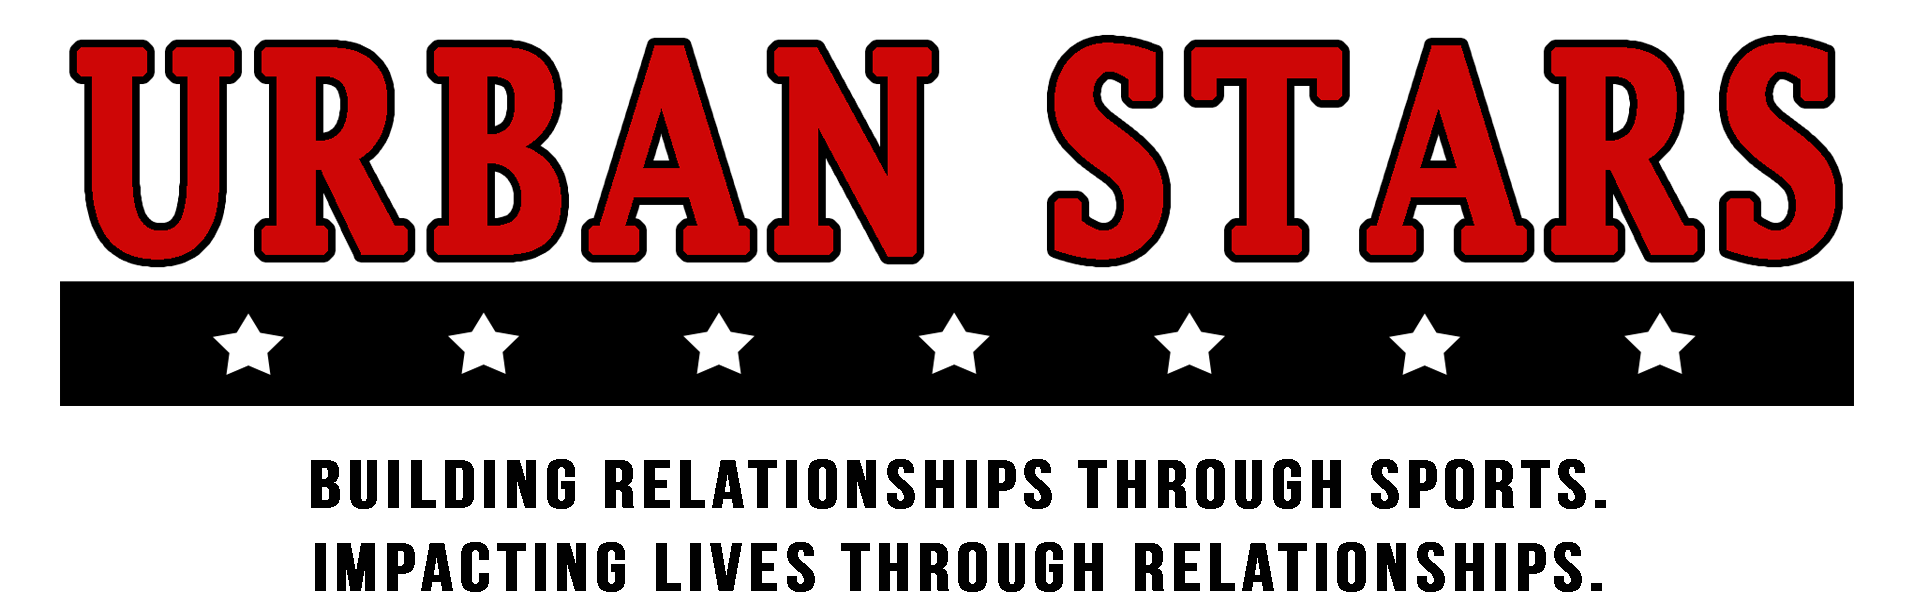 Urban stars banner clear